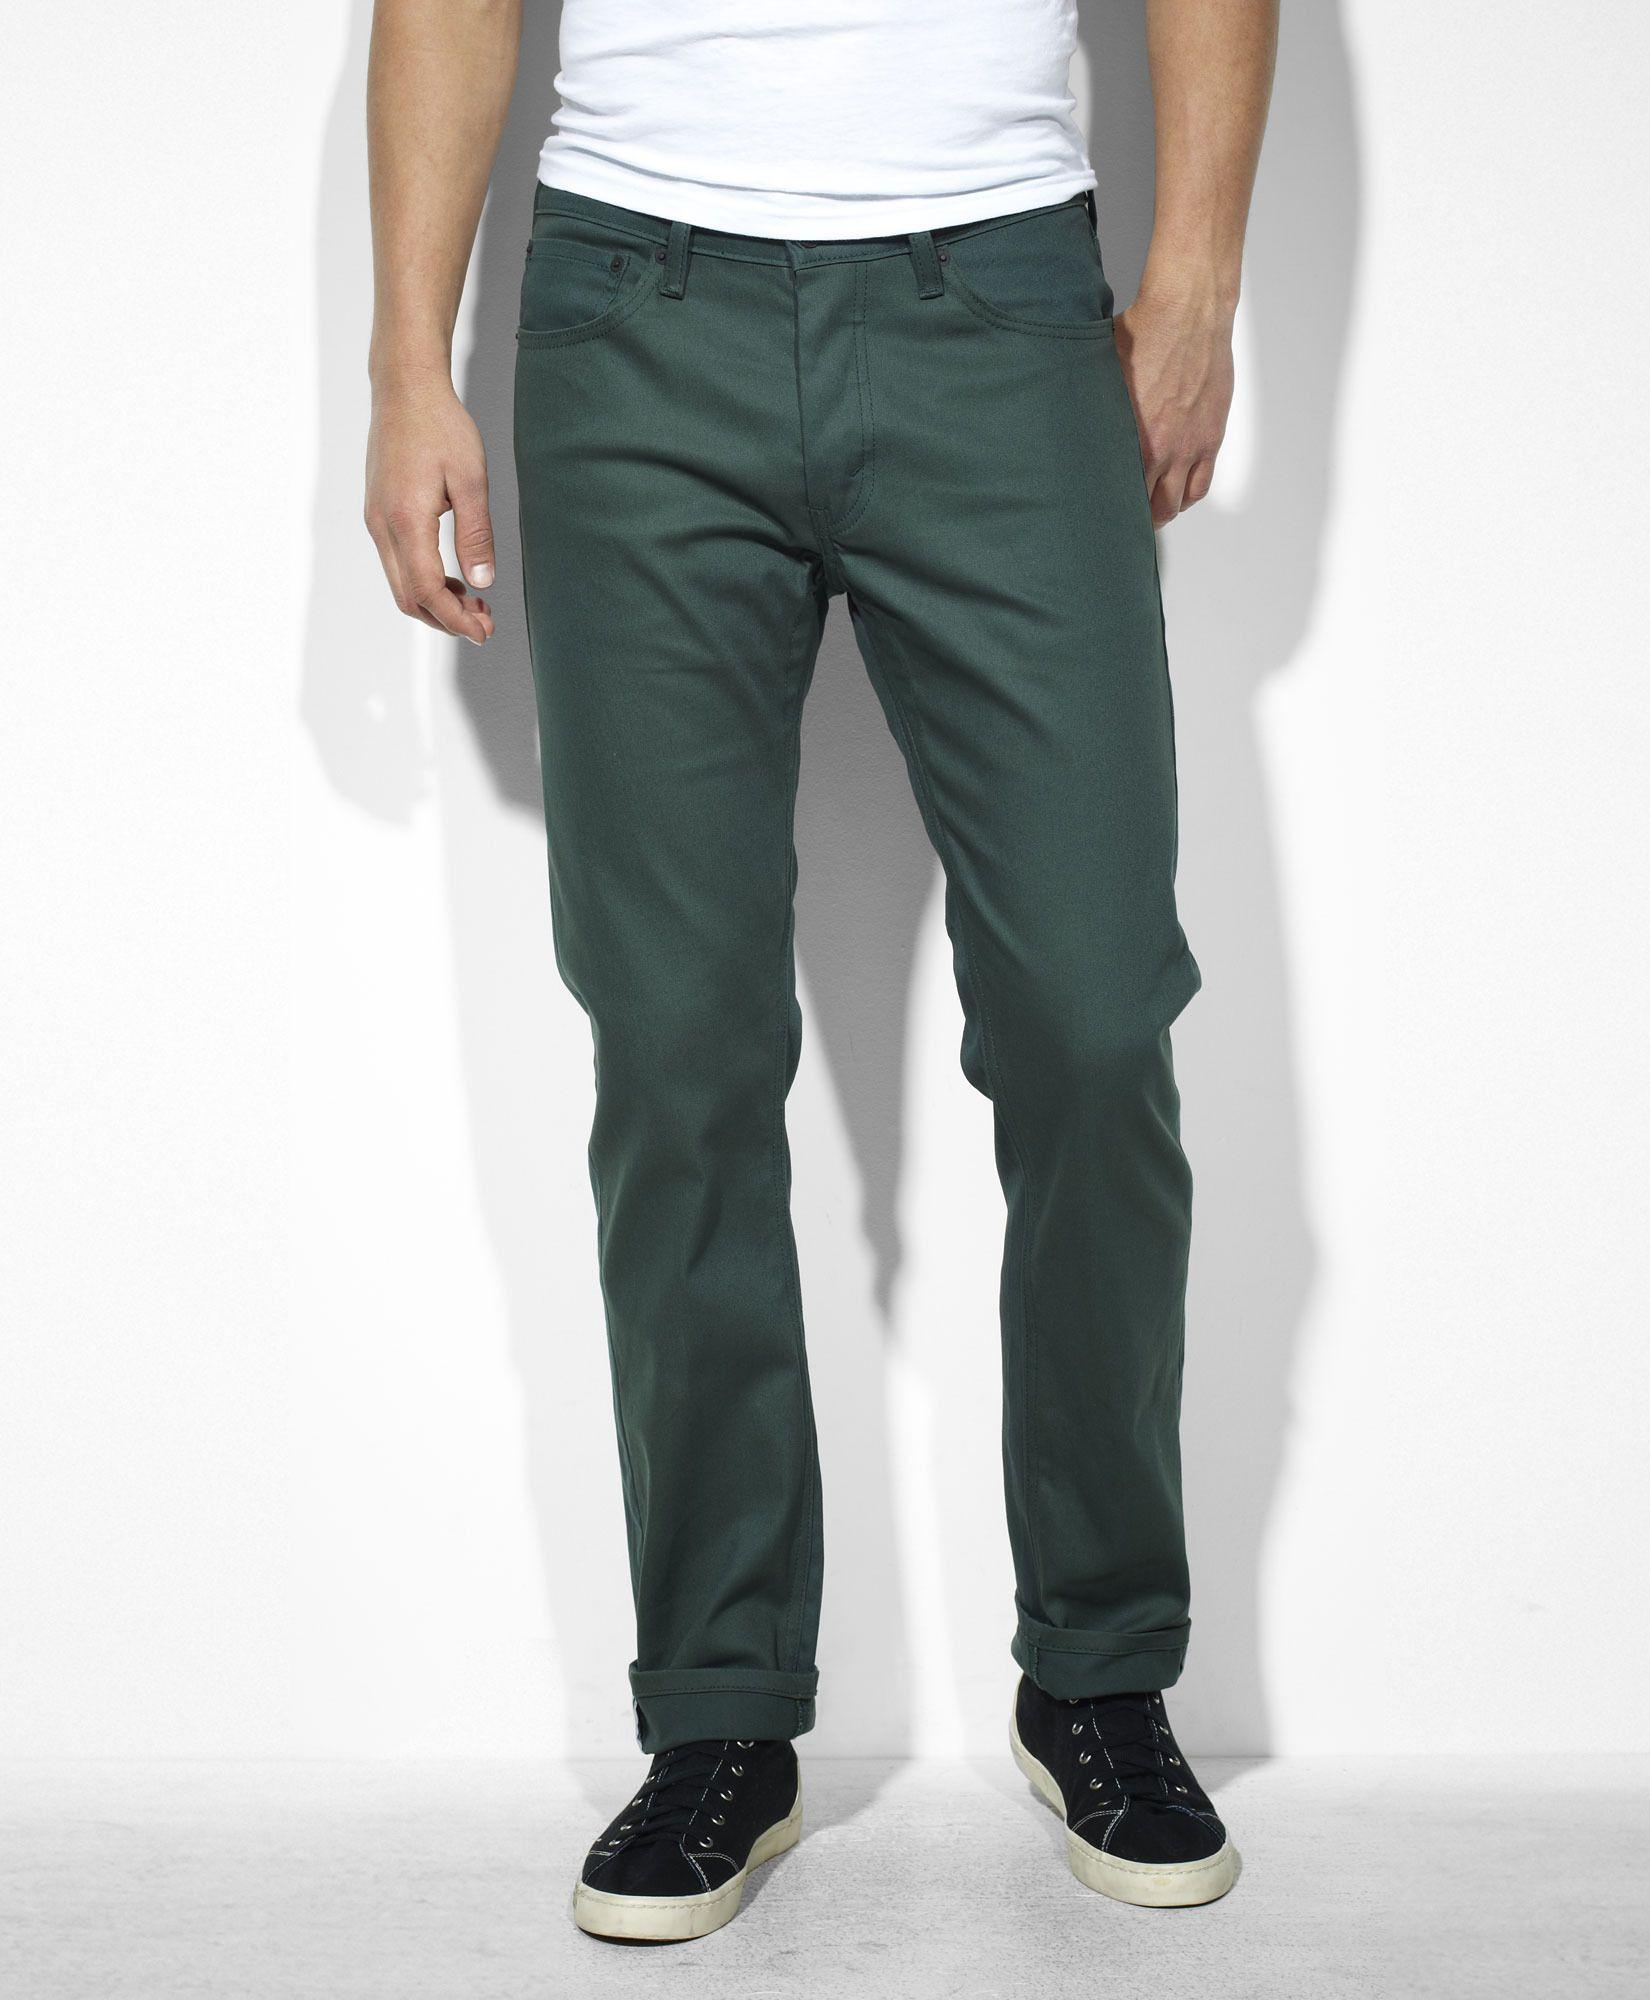 abe80dc6d08 $78 + Levi's 505™ Straight Commuter Jeans - Darkest Spruce - 505® Straight  Fit